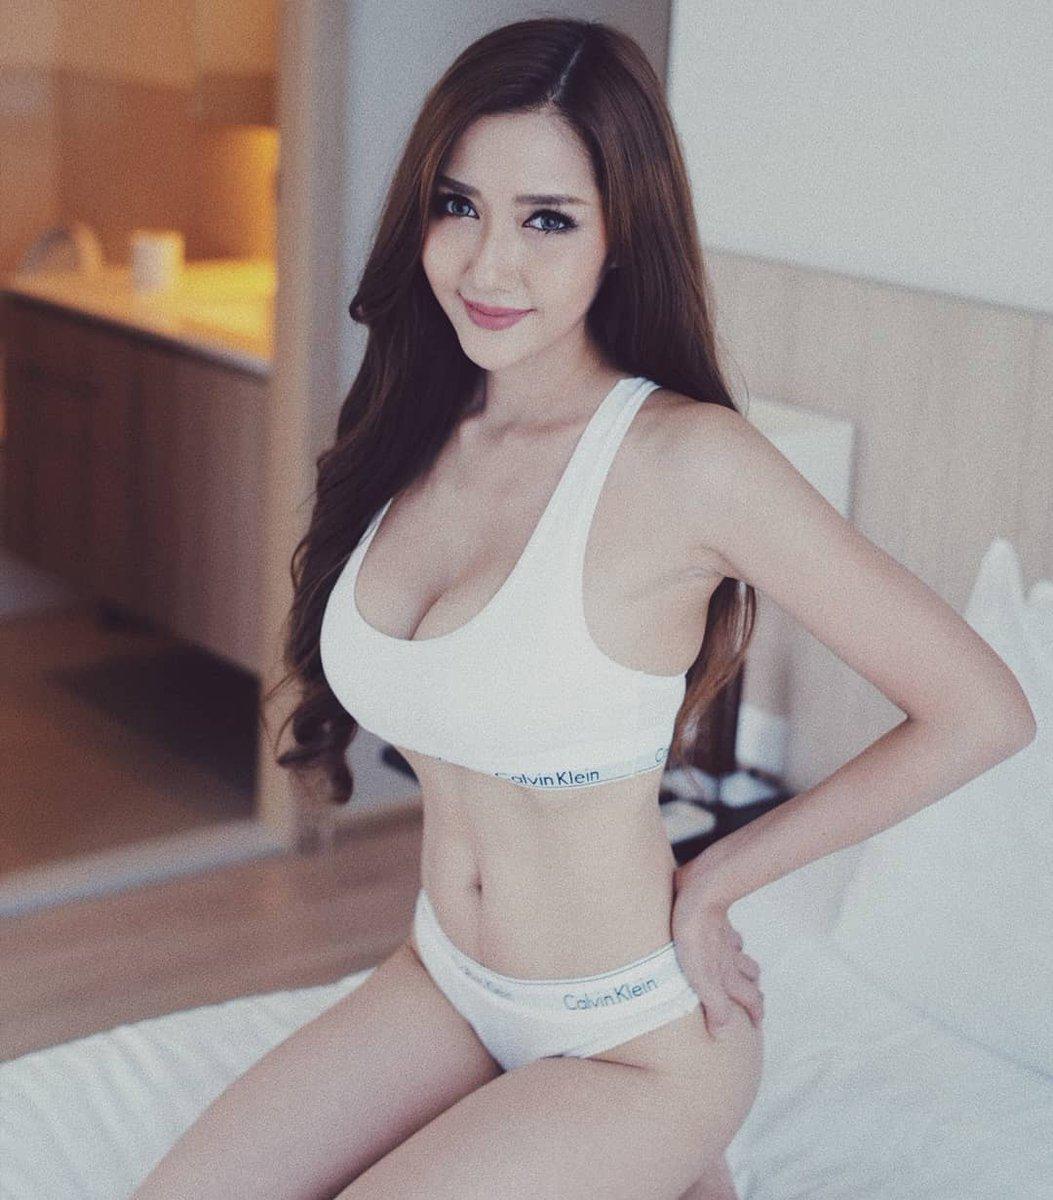 Sexy Model Playboy